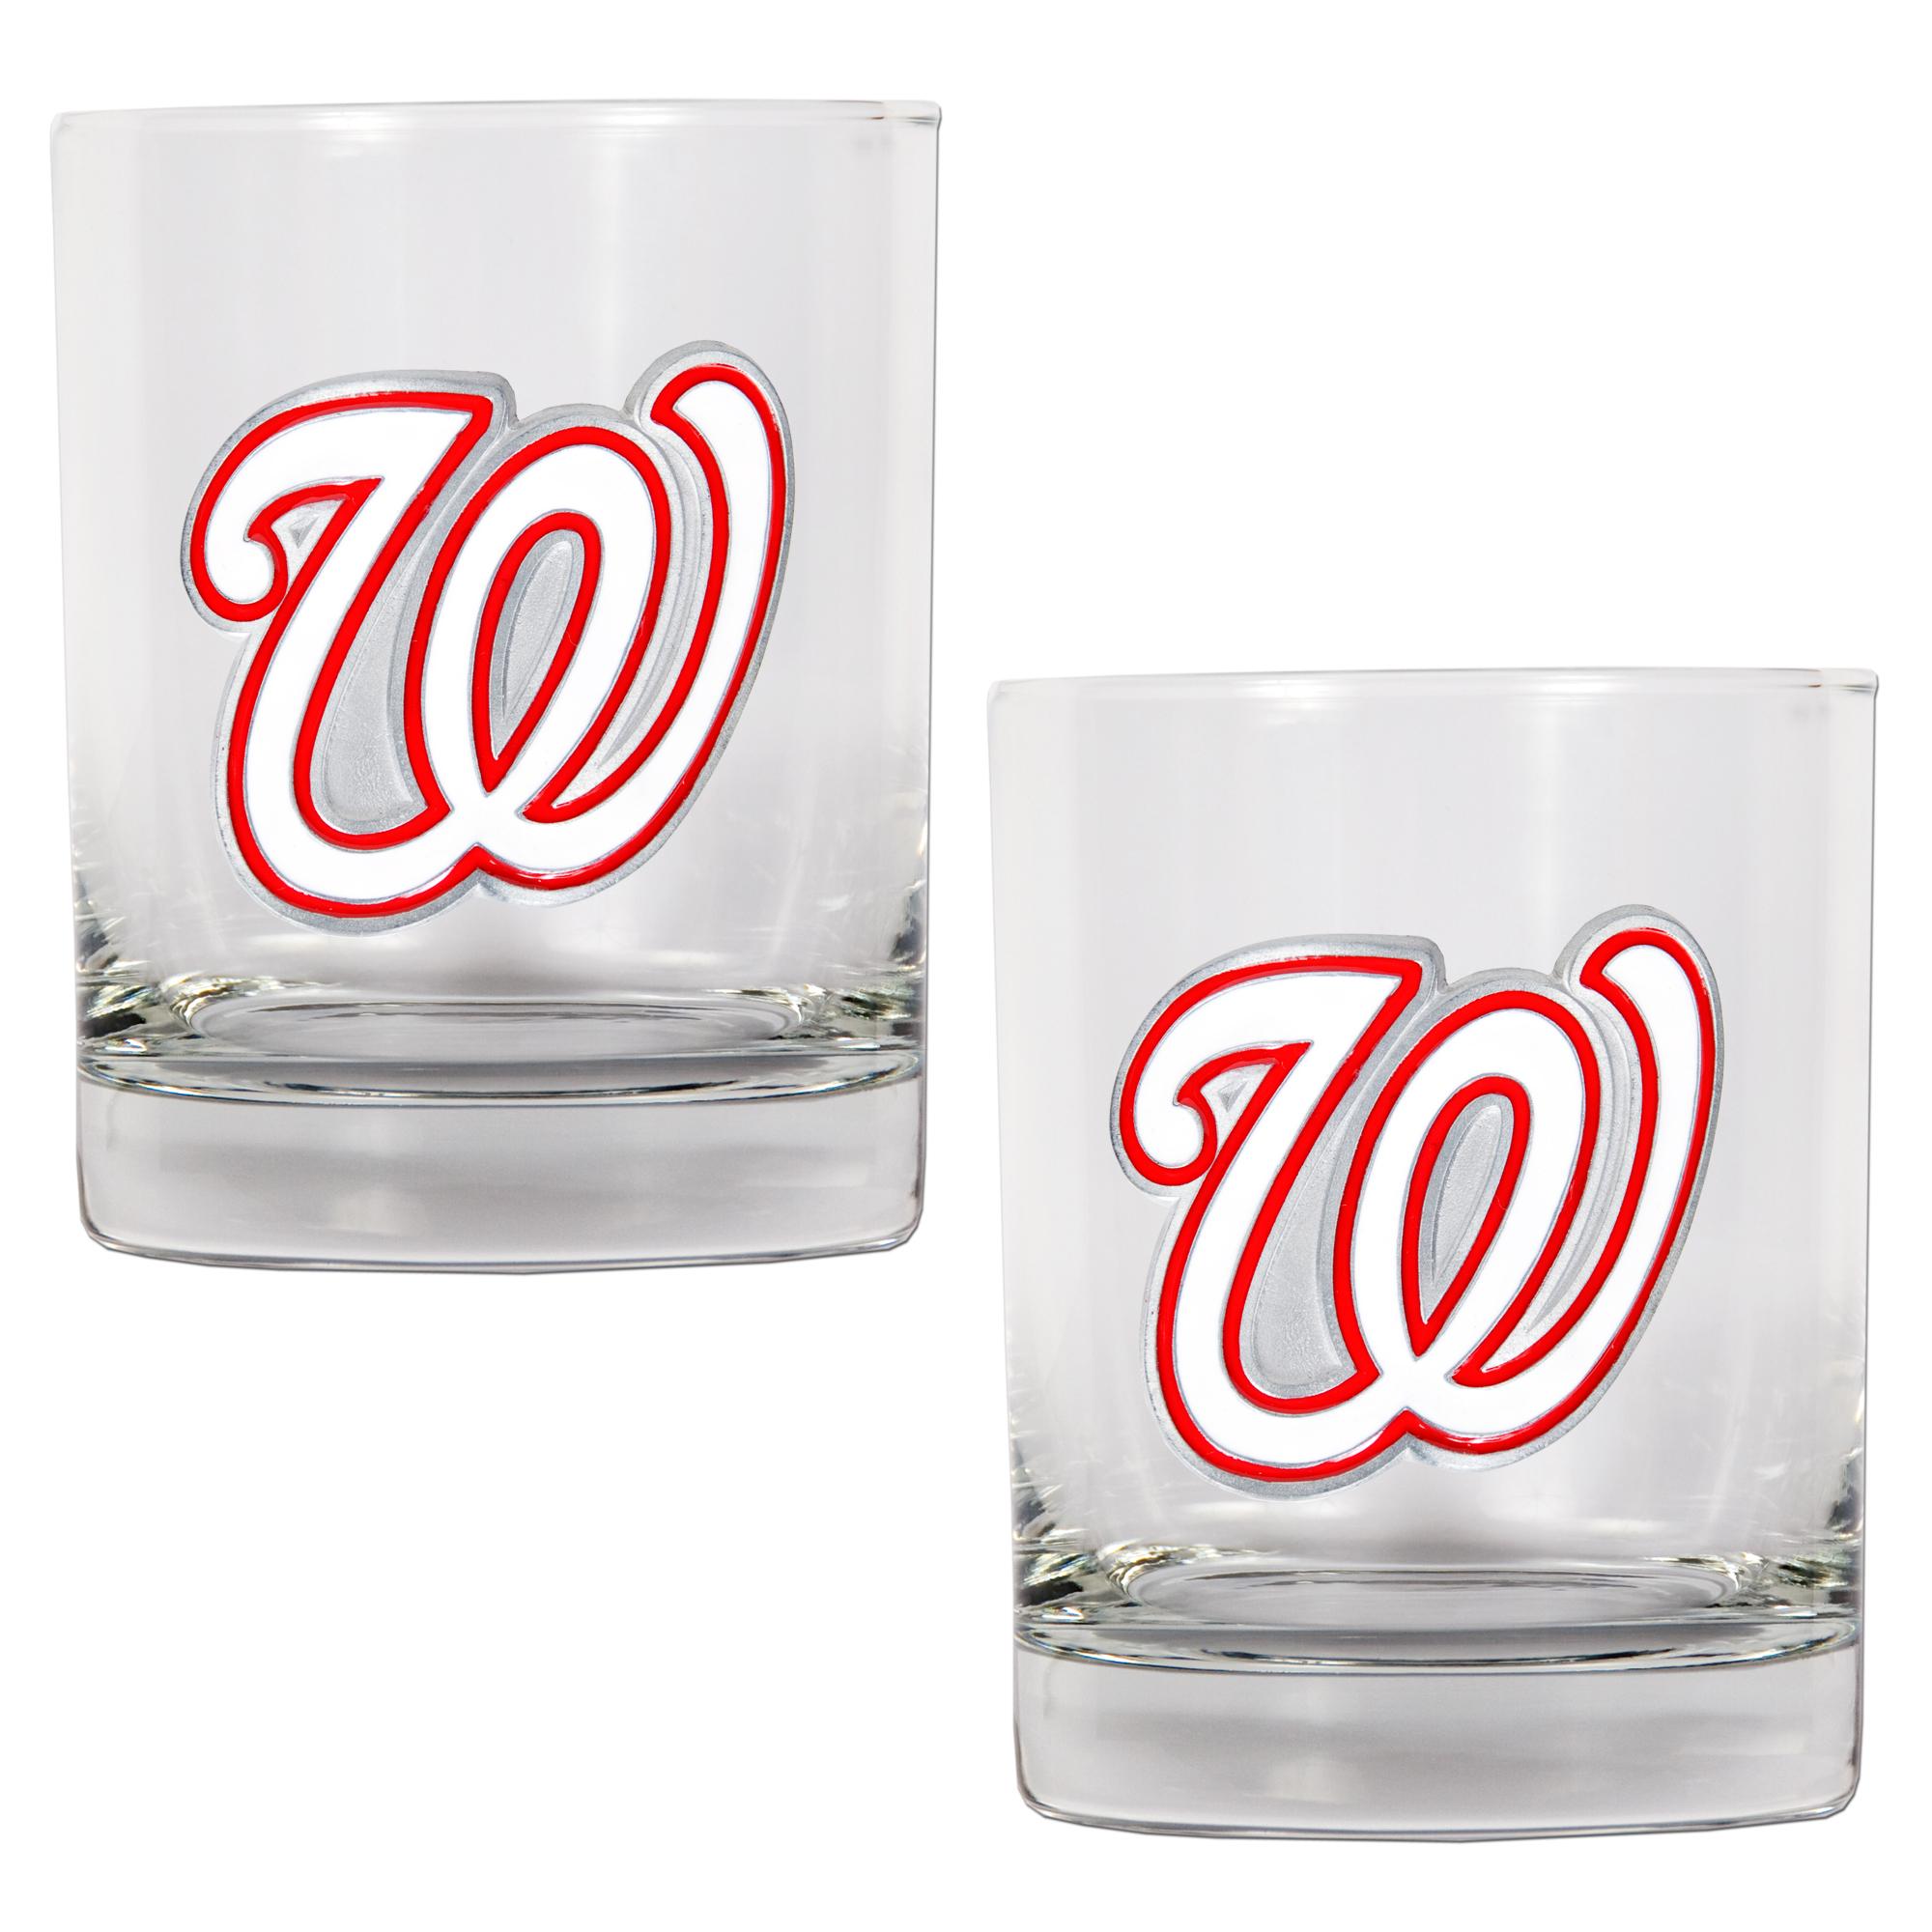 Washington Nationals 14oz. Rocks Glass Set - No Size